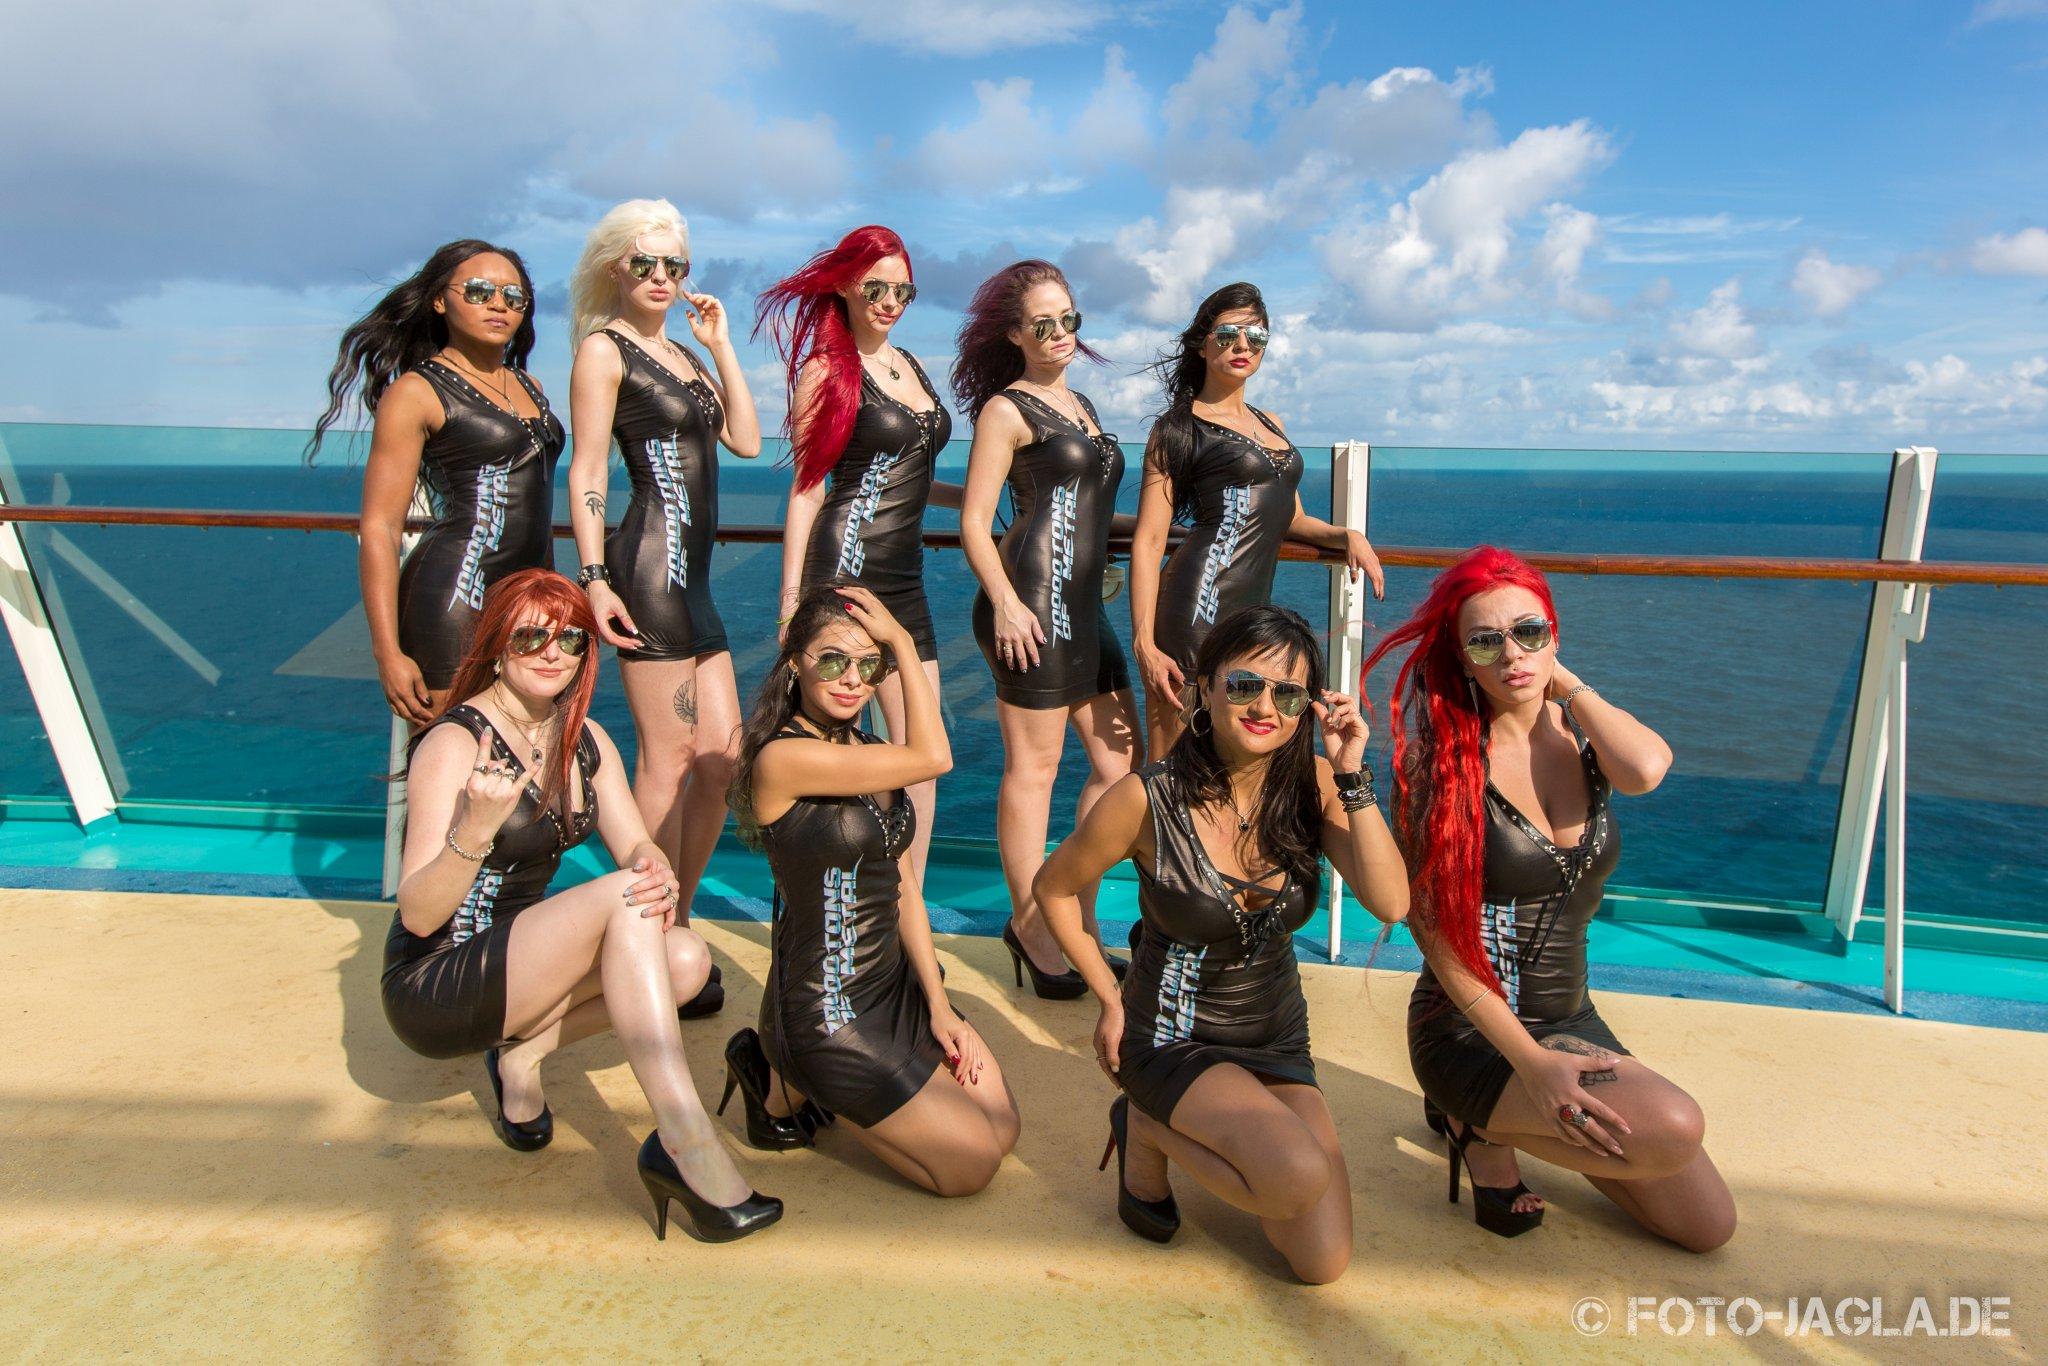 70000 Tons of Metal 2015 ::. Shooting with Poolgirls on Pooldeck